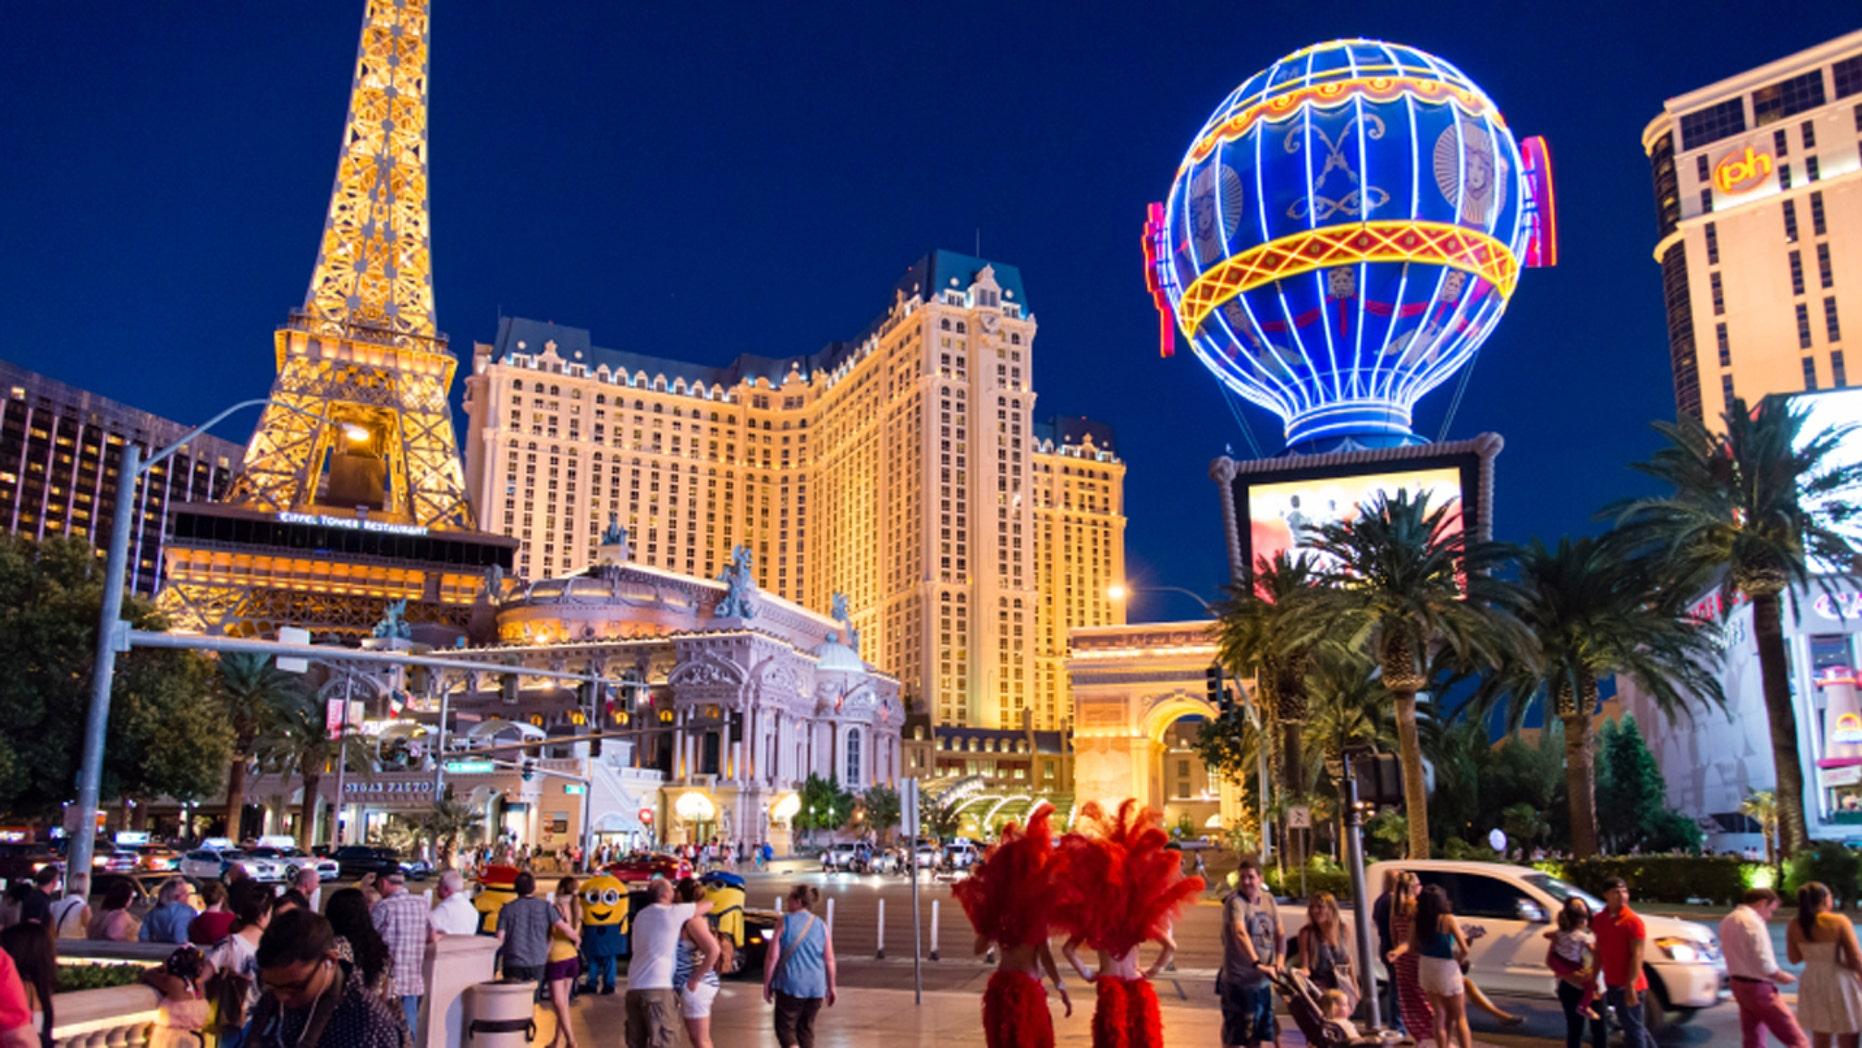 The city of Las Vegas